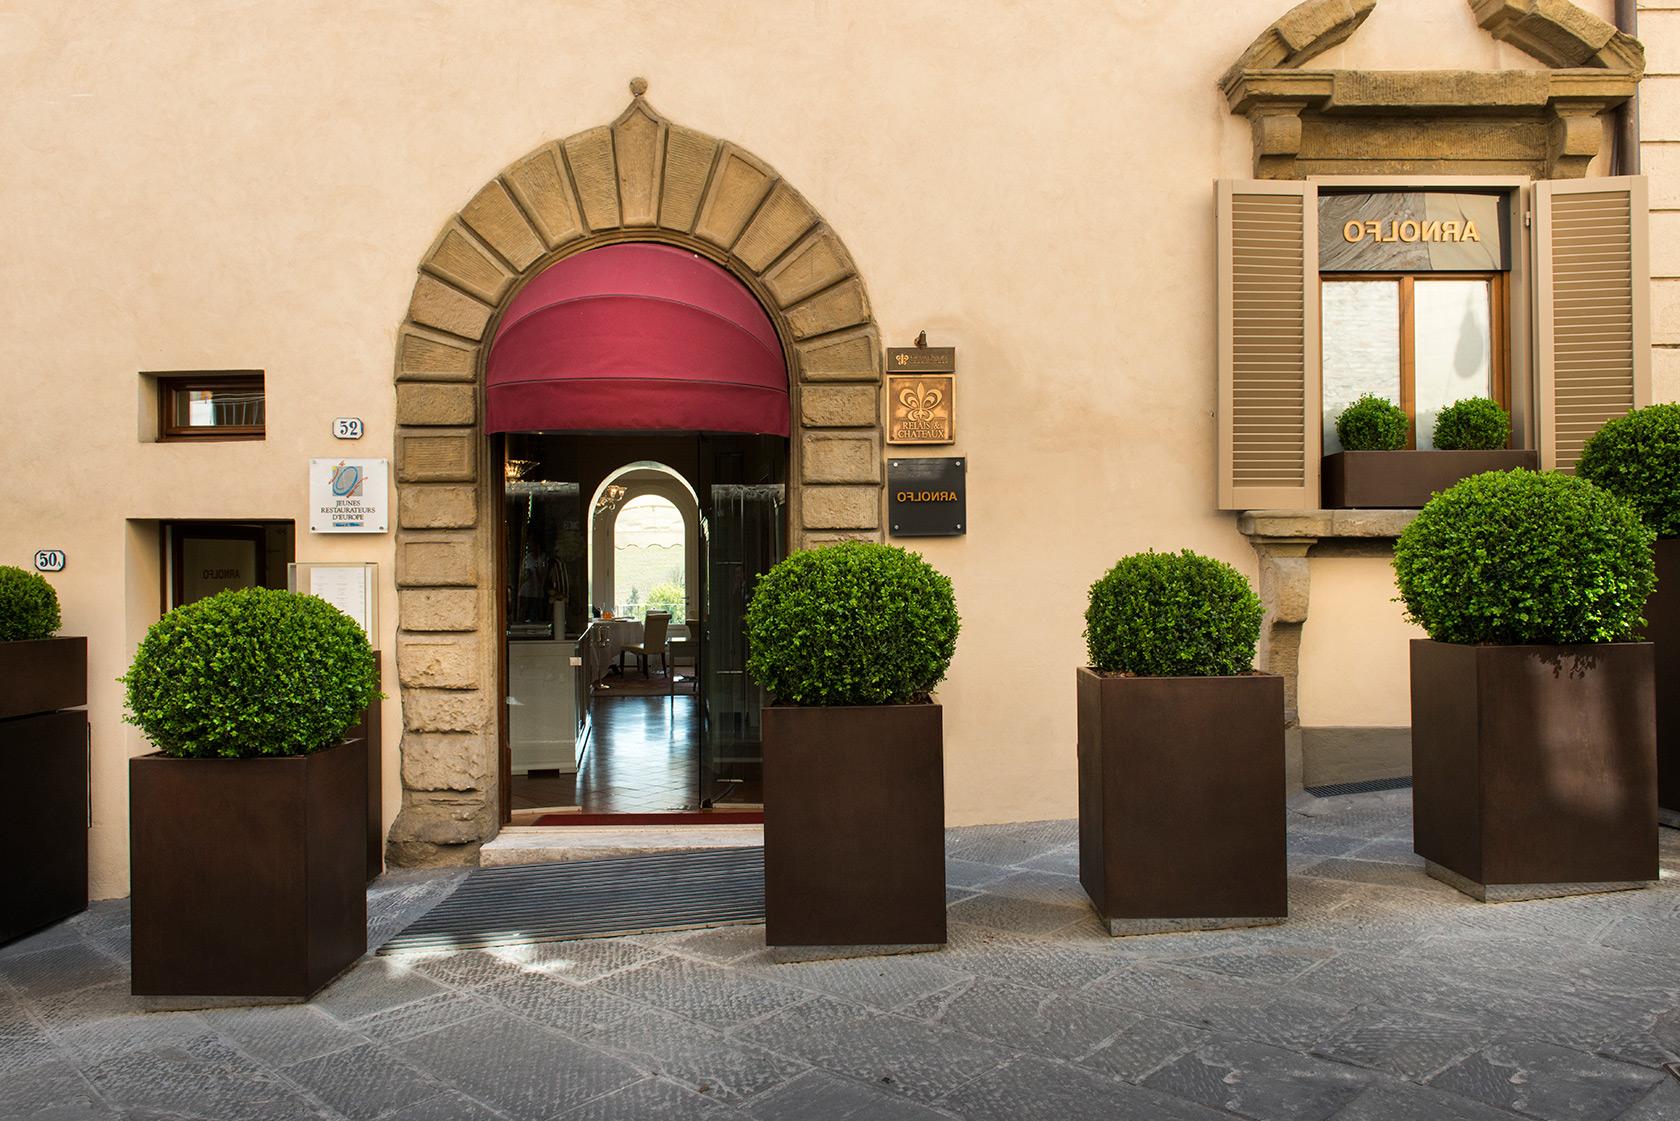 arnolfo-ristornate-ingresso-colle-val-delsa